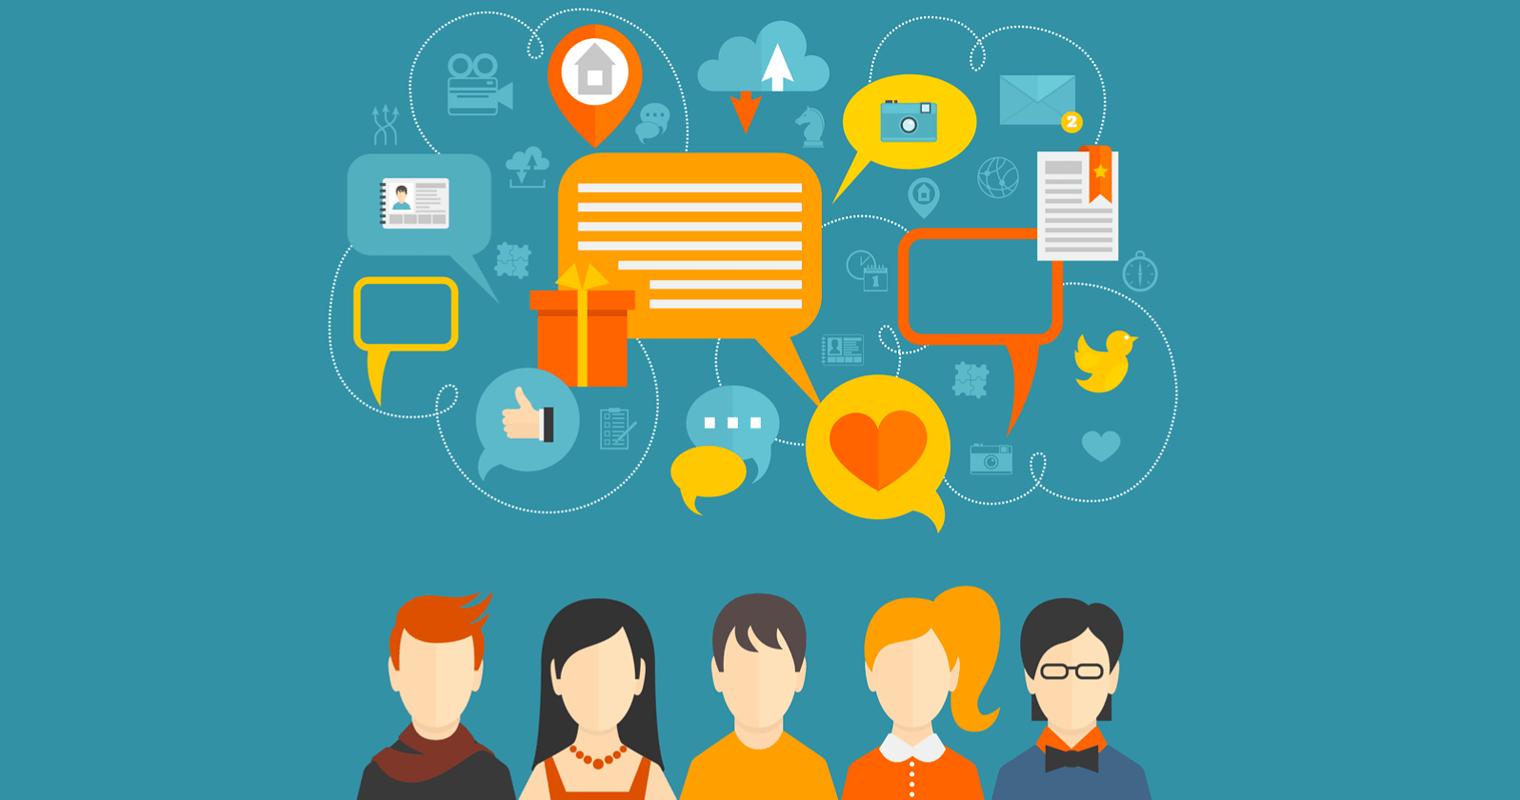 130 Social Sharing Sites That Boost SEO & Drive Traffic